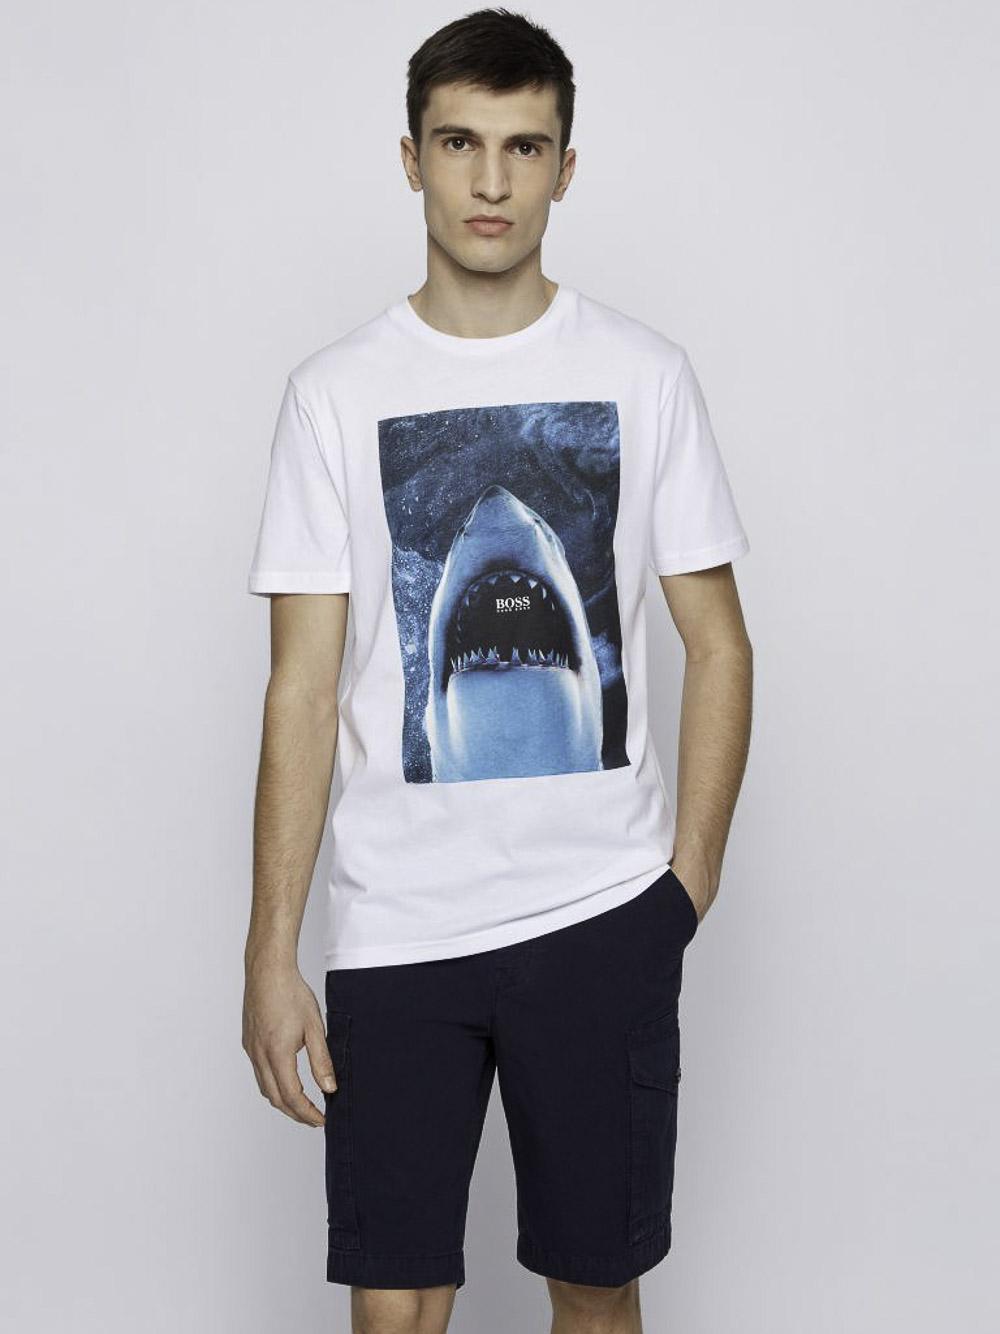 BOSS Μπλούζα t-shirt 50450911-100 ΛΕΥΚΟ